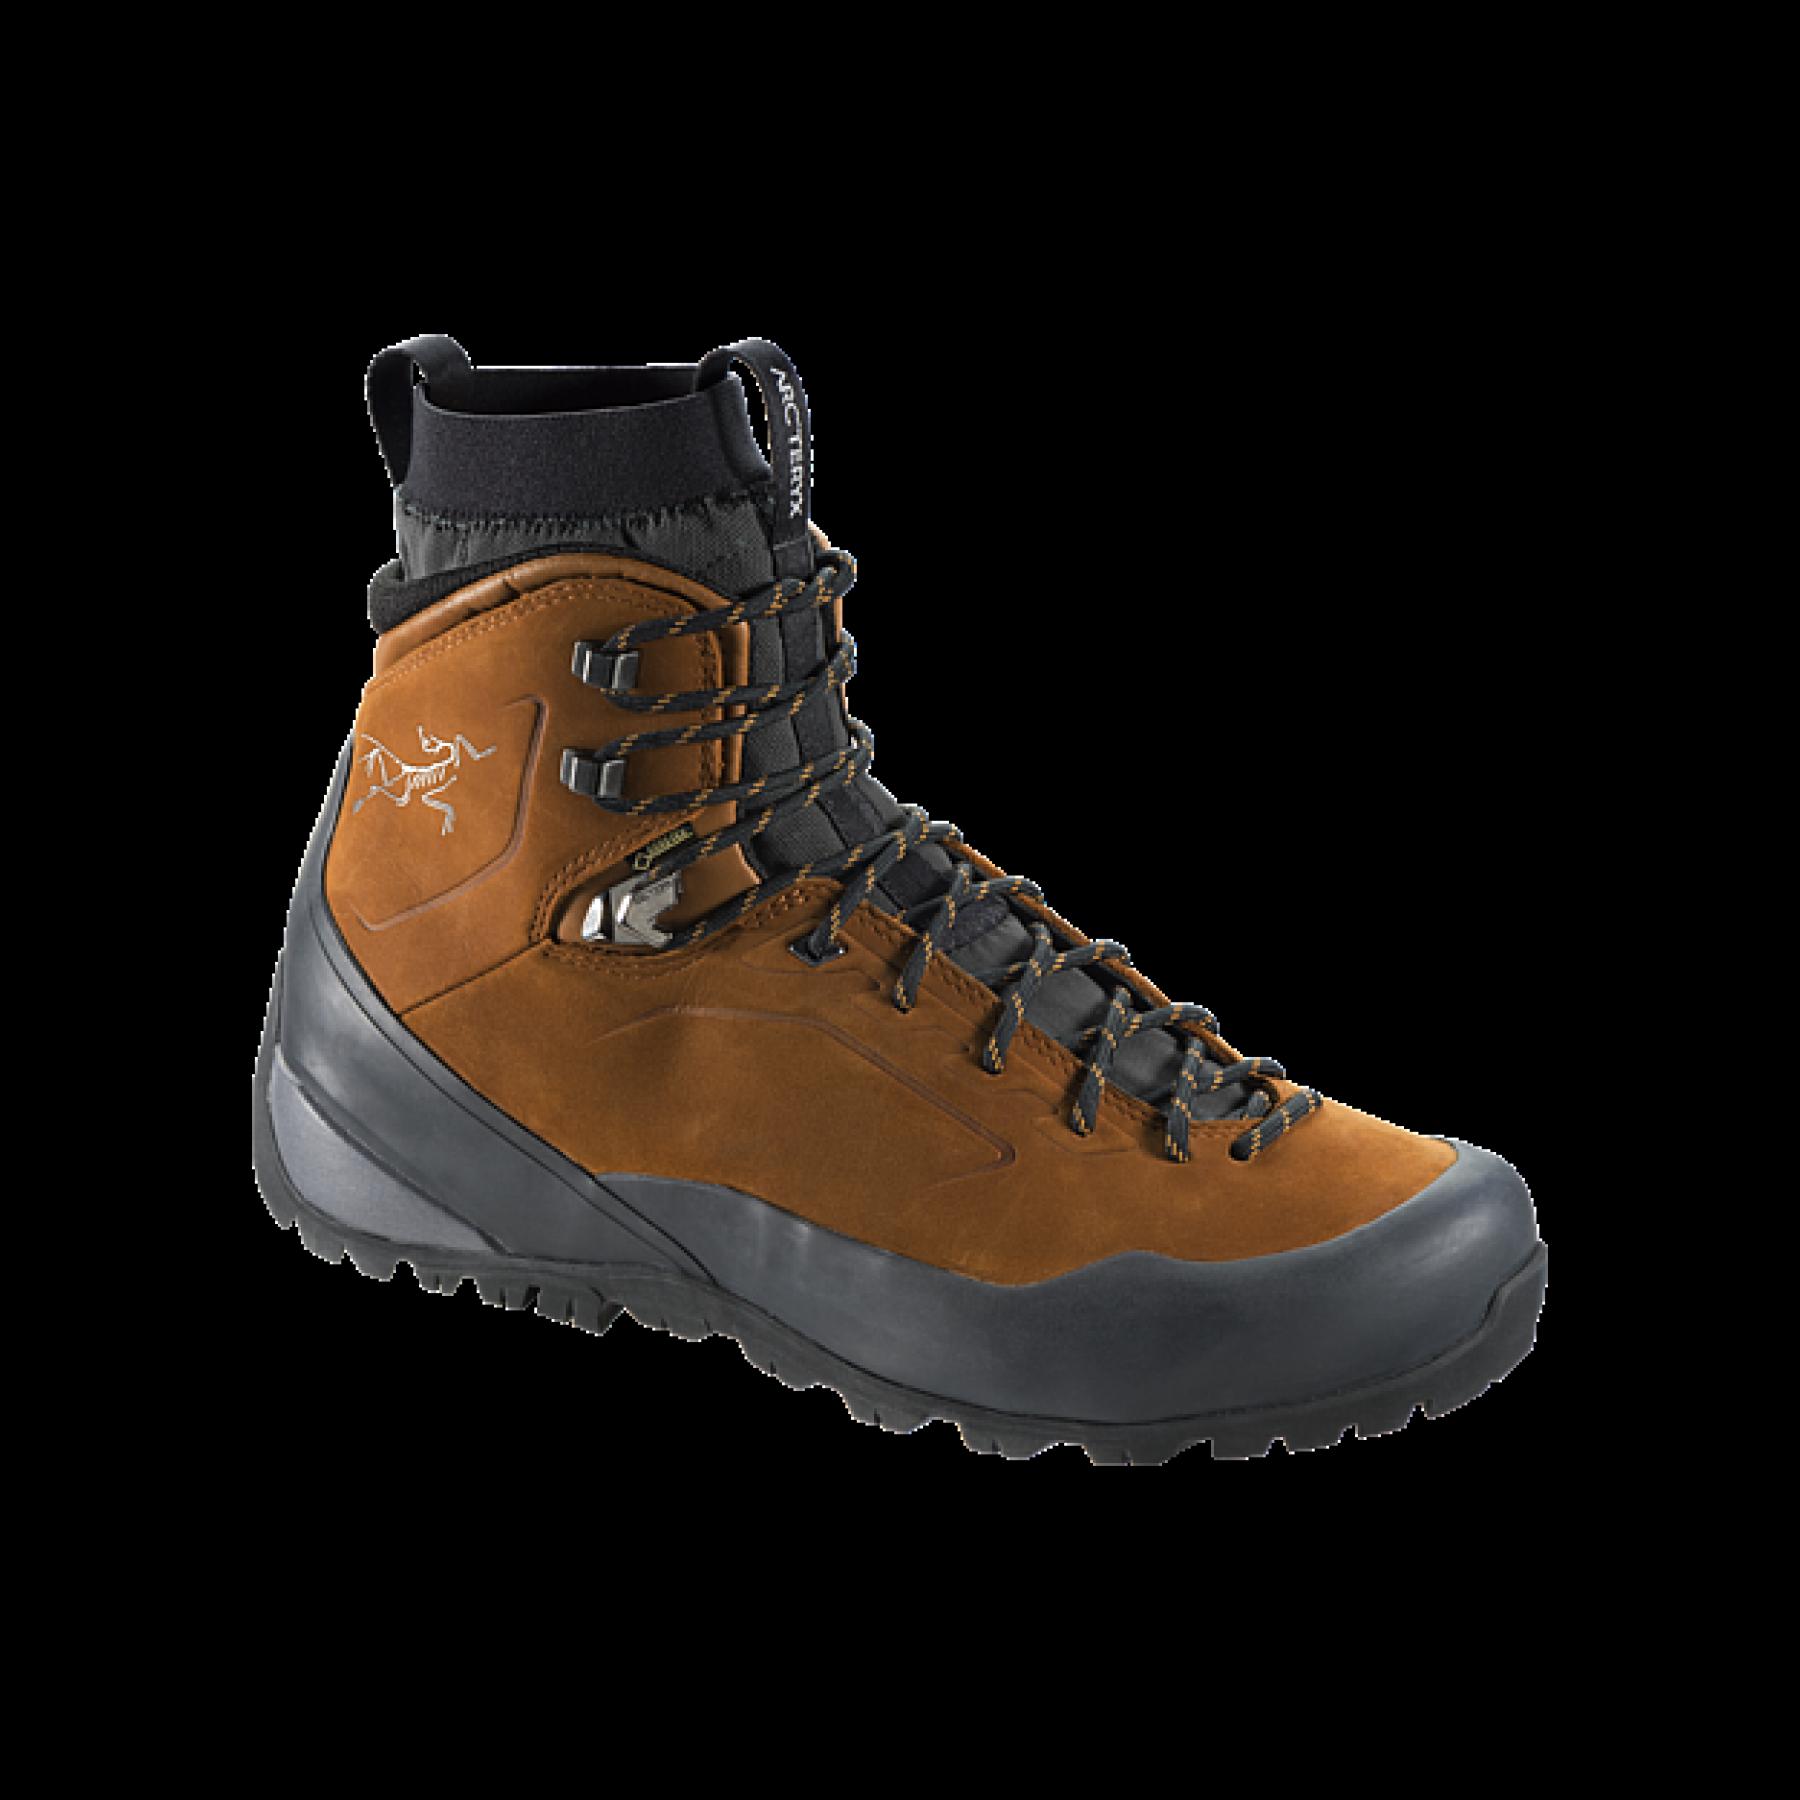 535ba766add Arc'teryx Bora Mid Leather GTX Hiking Boot Men's Cedar/Graphite